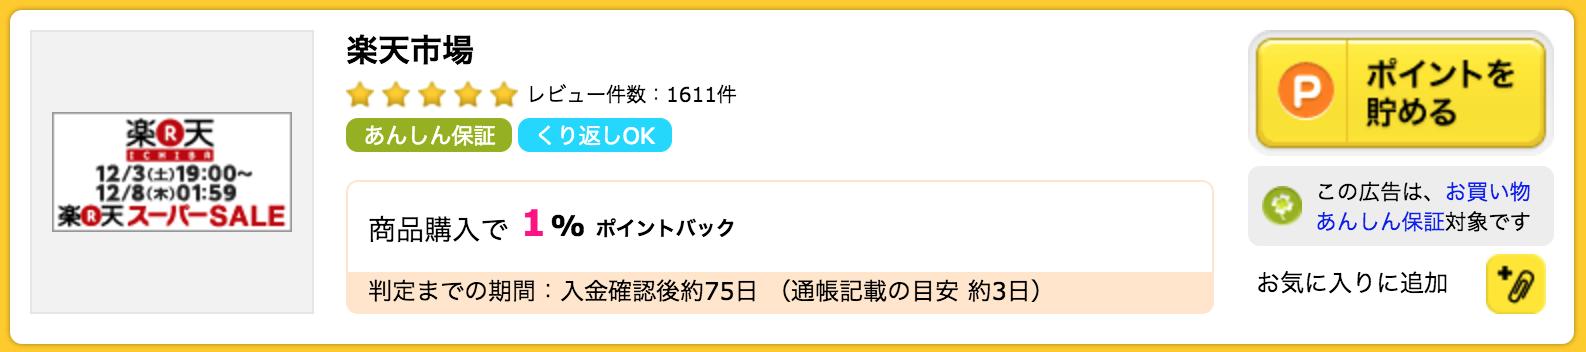 f:id:kanamalu:20161203012654p:plain